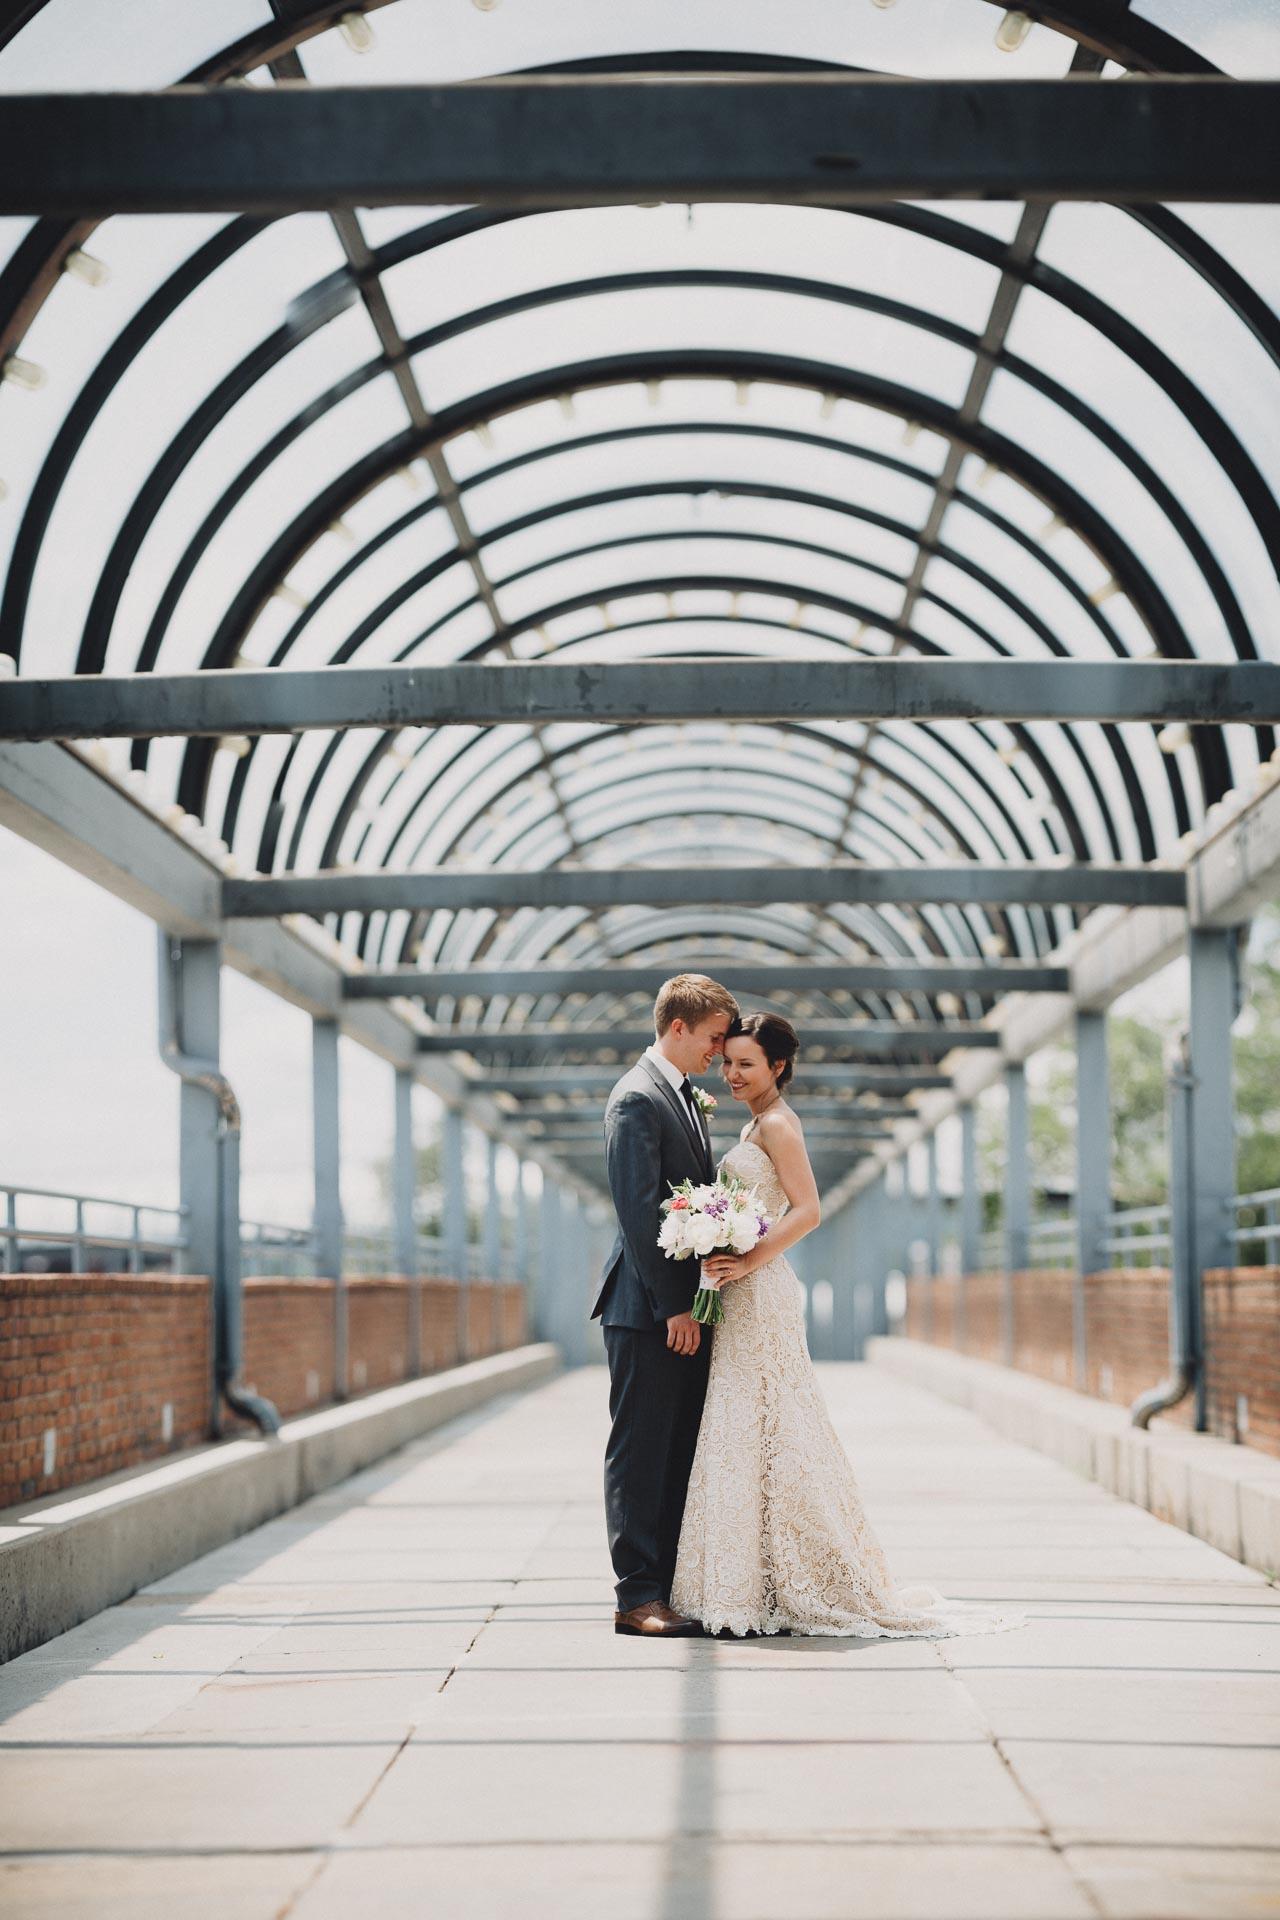 Julia-Michael-Cincinnati-Music-Hall-Wedding-059@2x.jpg